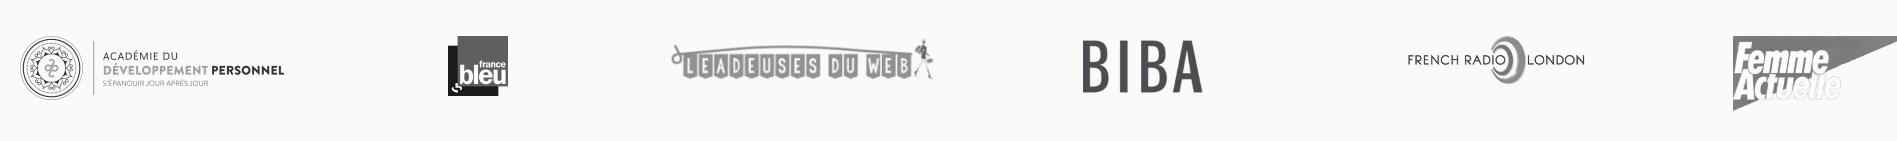 logos-presse -edith